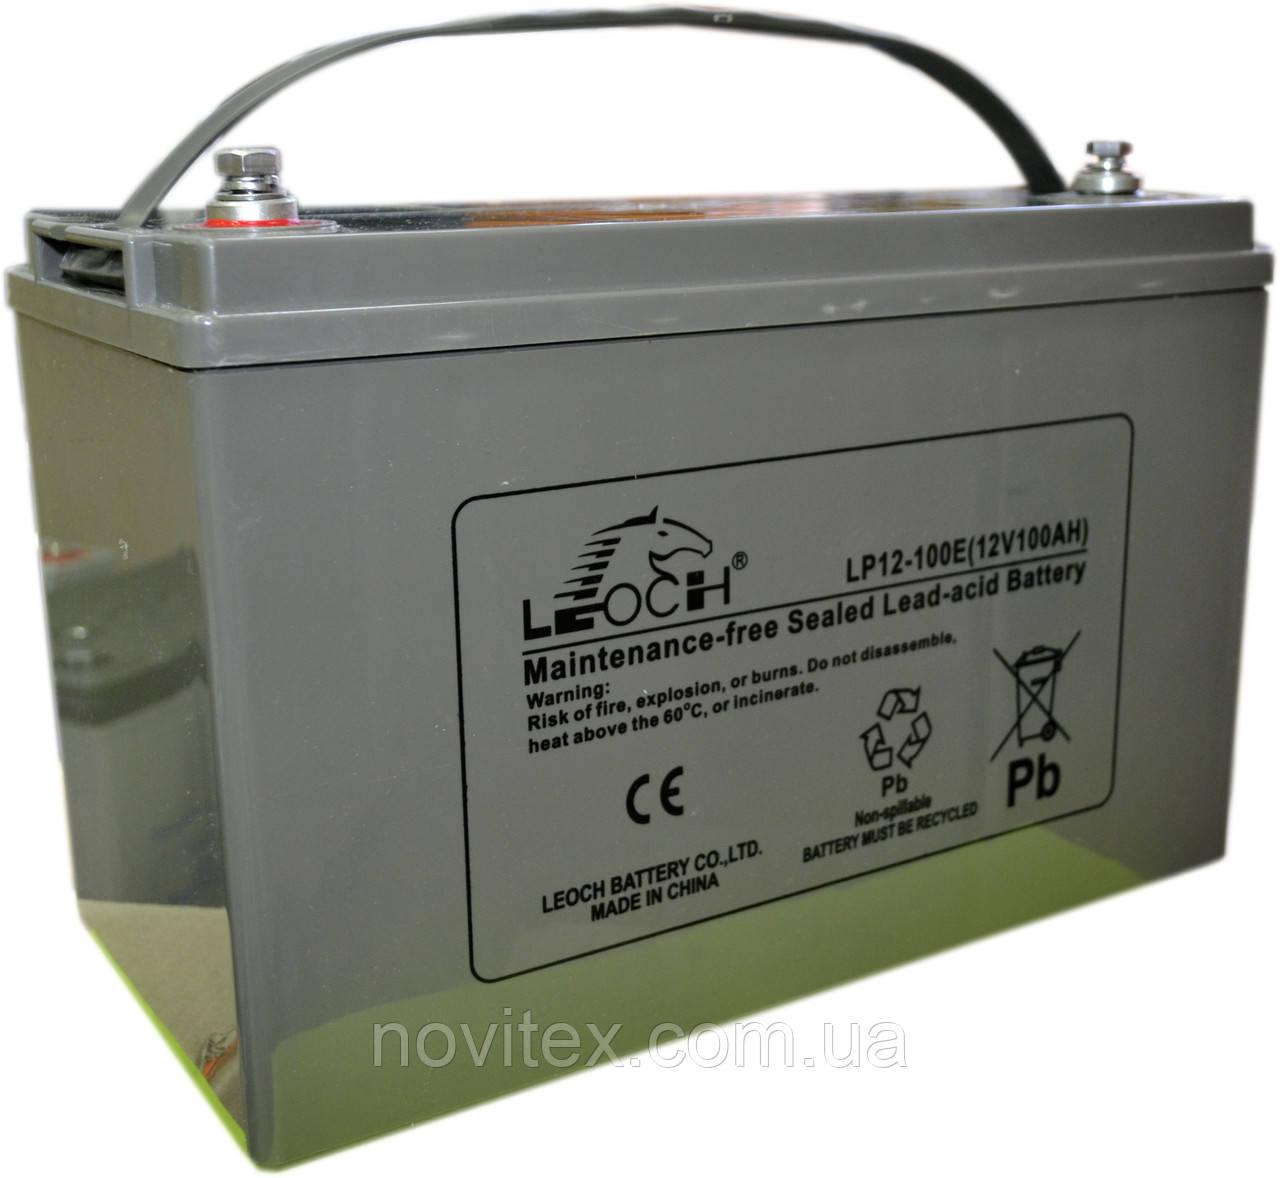 Аккумулятор мультигелевый  Leoch LX12-100E 12В 100Ah